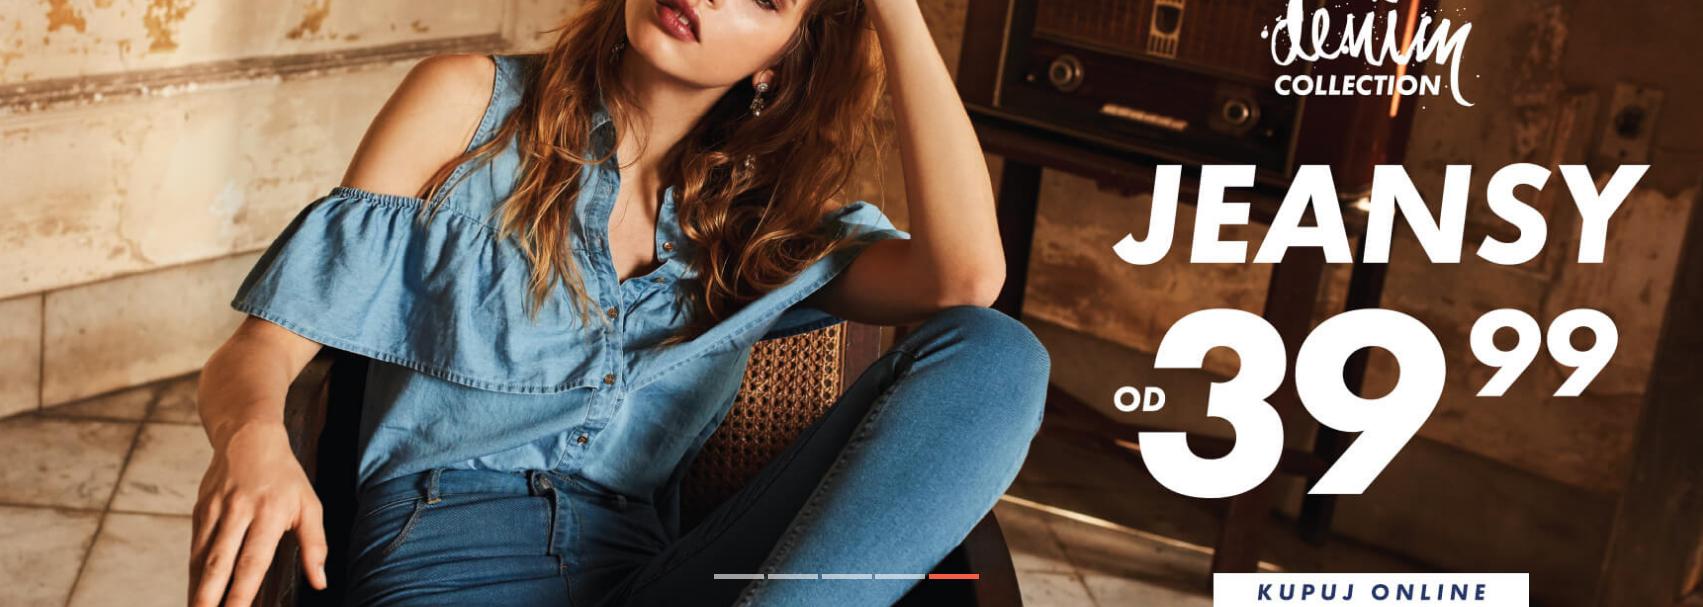 Sinsay: jeansy od 39,99 zł                         title=